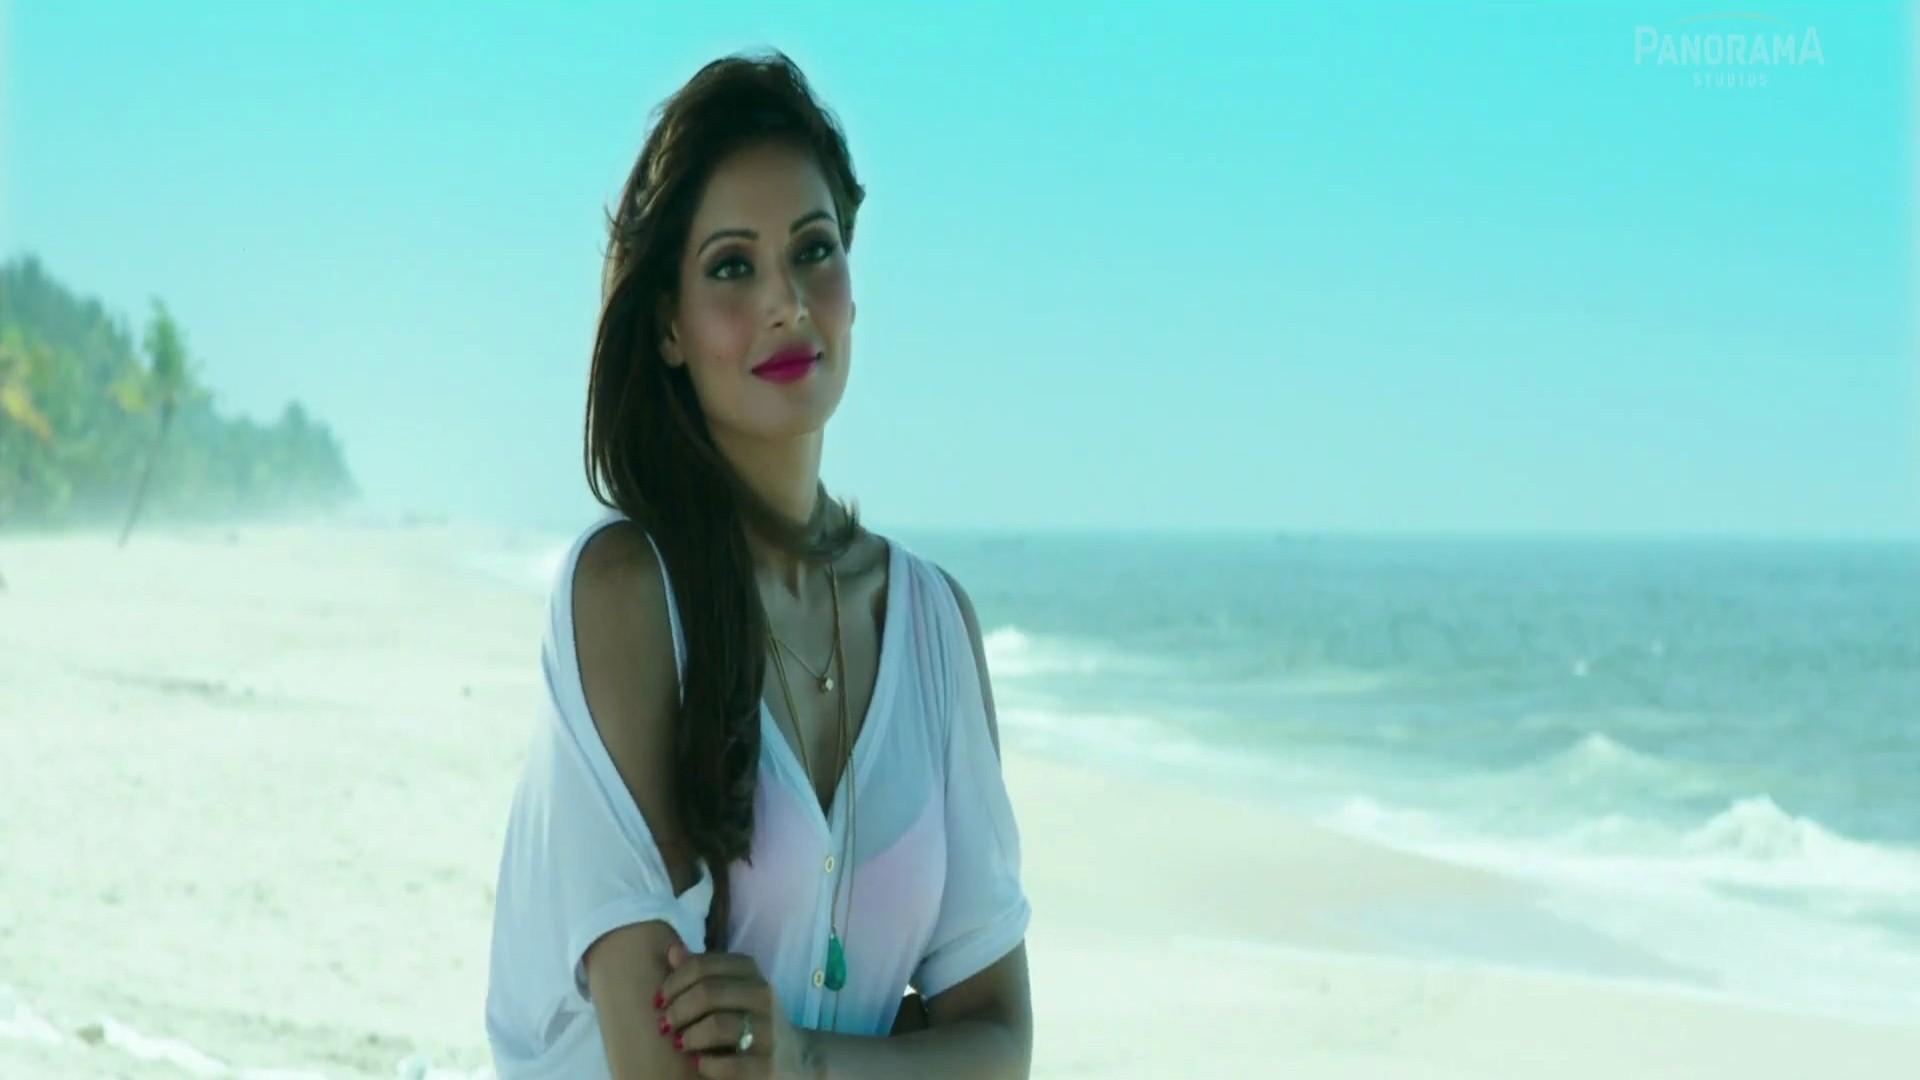 Popular Indian Female Celebrity Bipasha Basu at Beach and Wear White Top  Scene of Movie Alone HD Photo